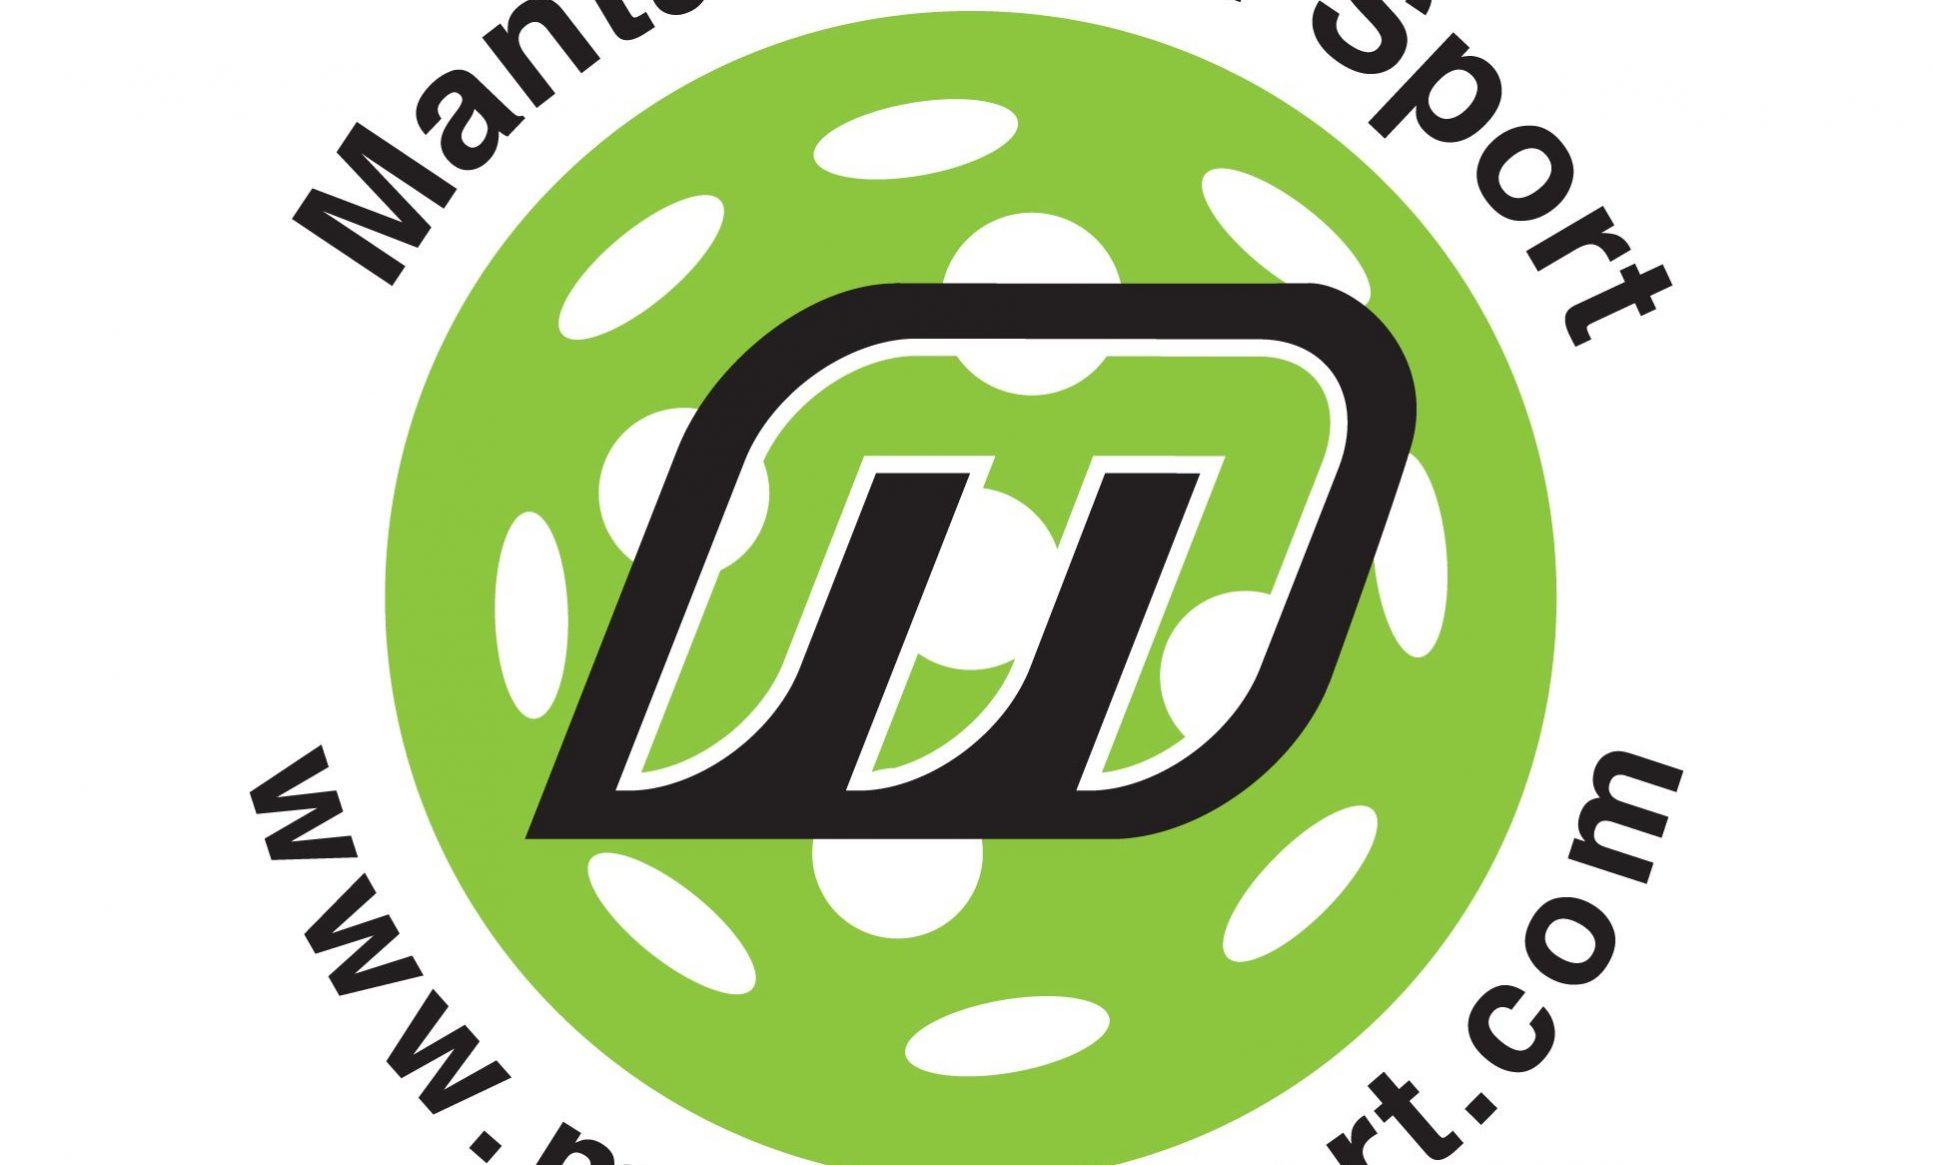 Manta_New_PB_Logo